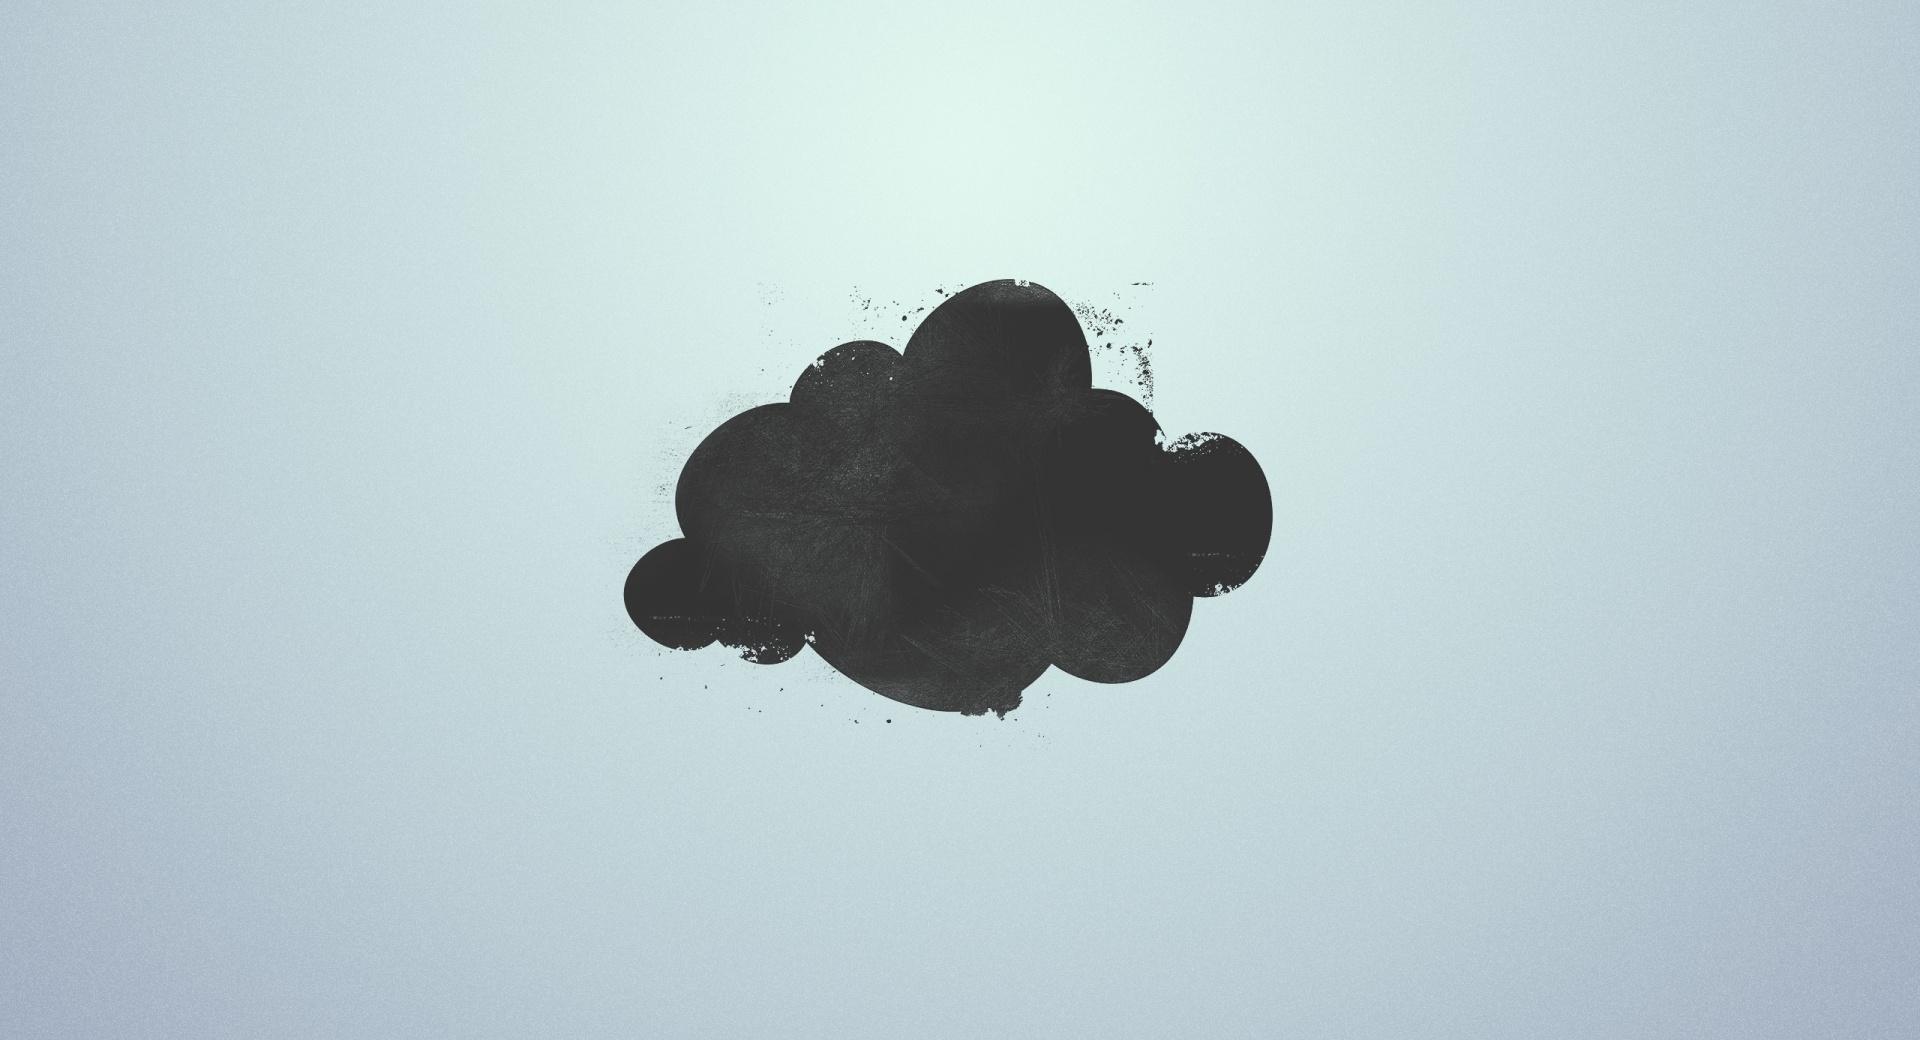 Dark Cloud wallpapers HD quality